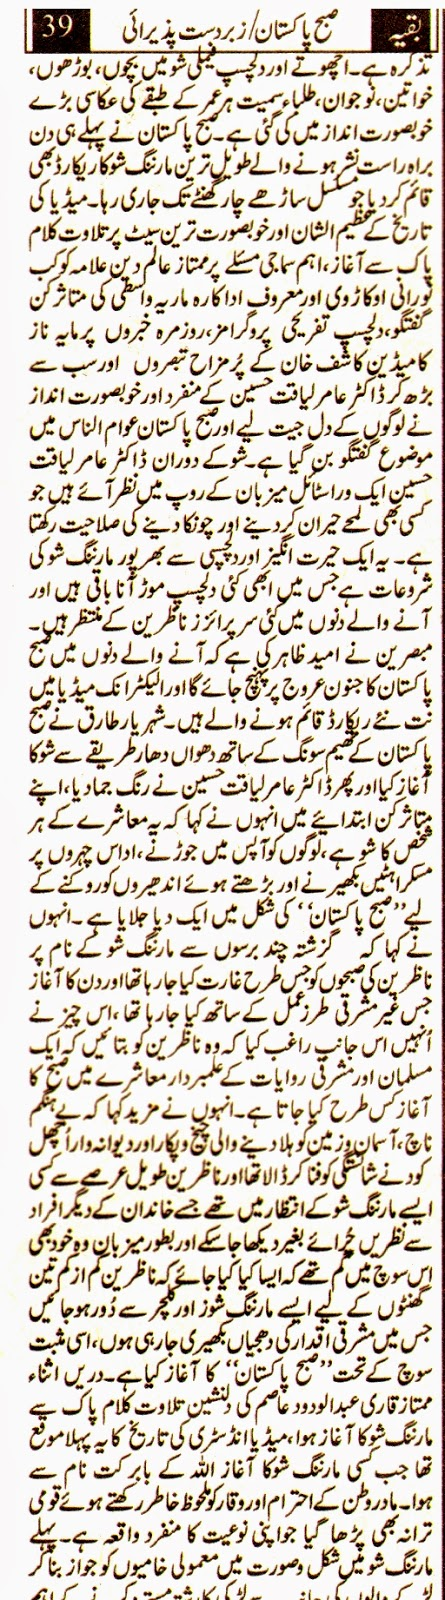 geo subh e pakistan show november article allama kokab noorani okarvi